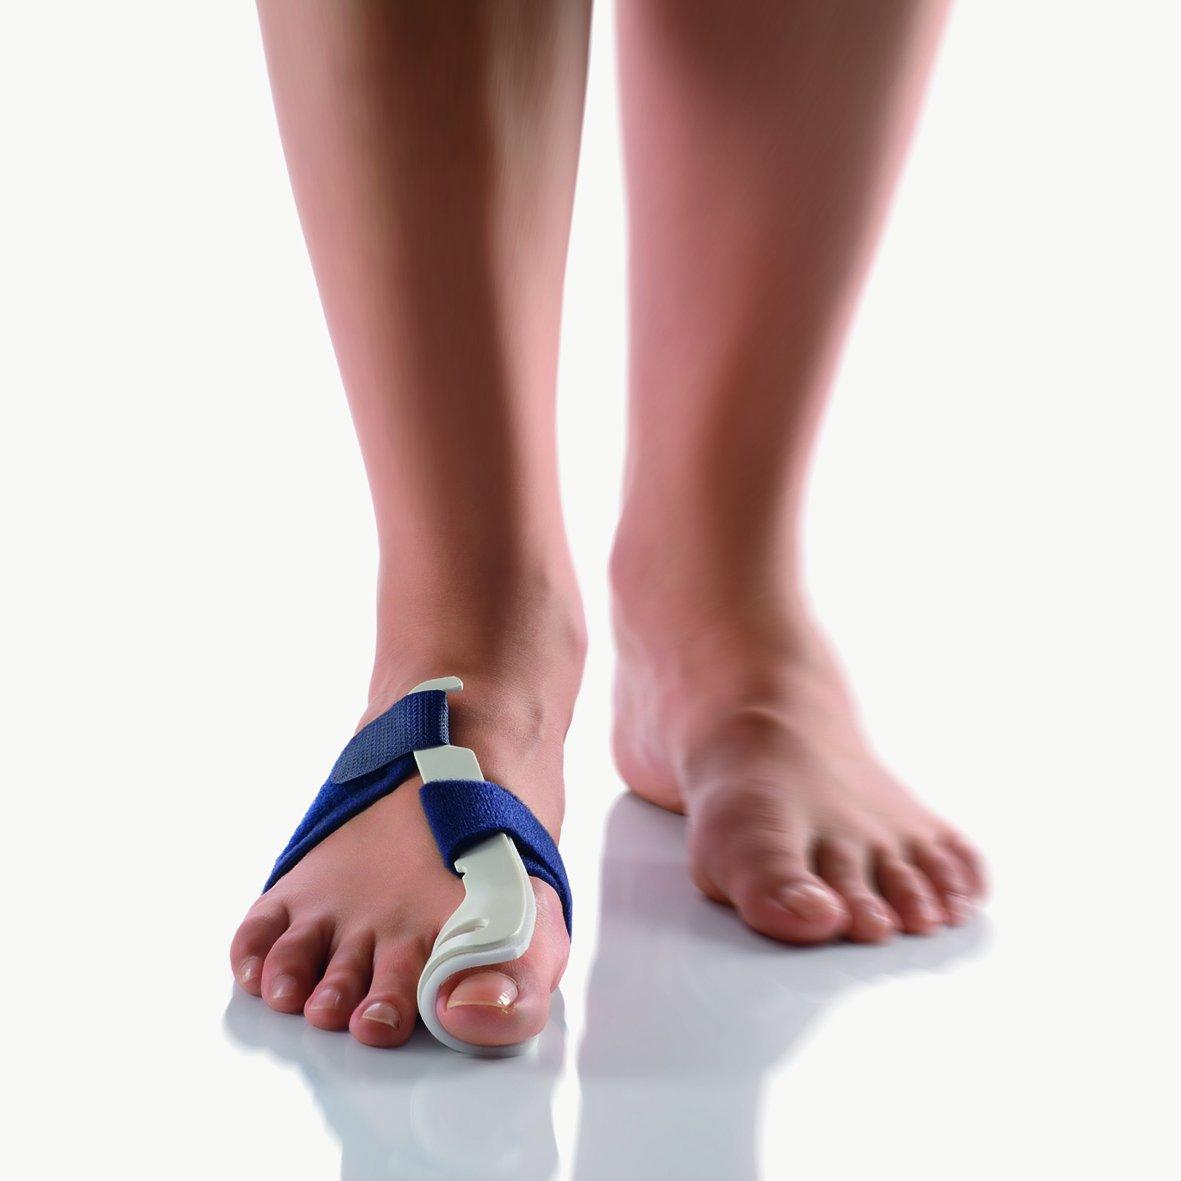 BORT Valco® Hallux Valgus Bunion Night Splint Bunion Corrector Bunion Splint Big Toe Straightener Hammertoe Hallux Valgus Foot Pain Relief Compare to Valguloc Bunion Splint Large, Right